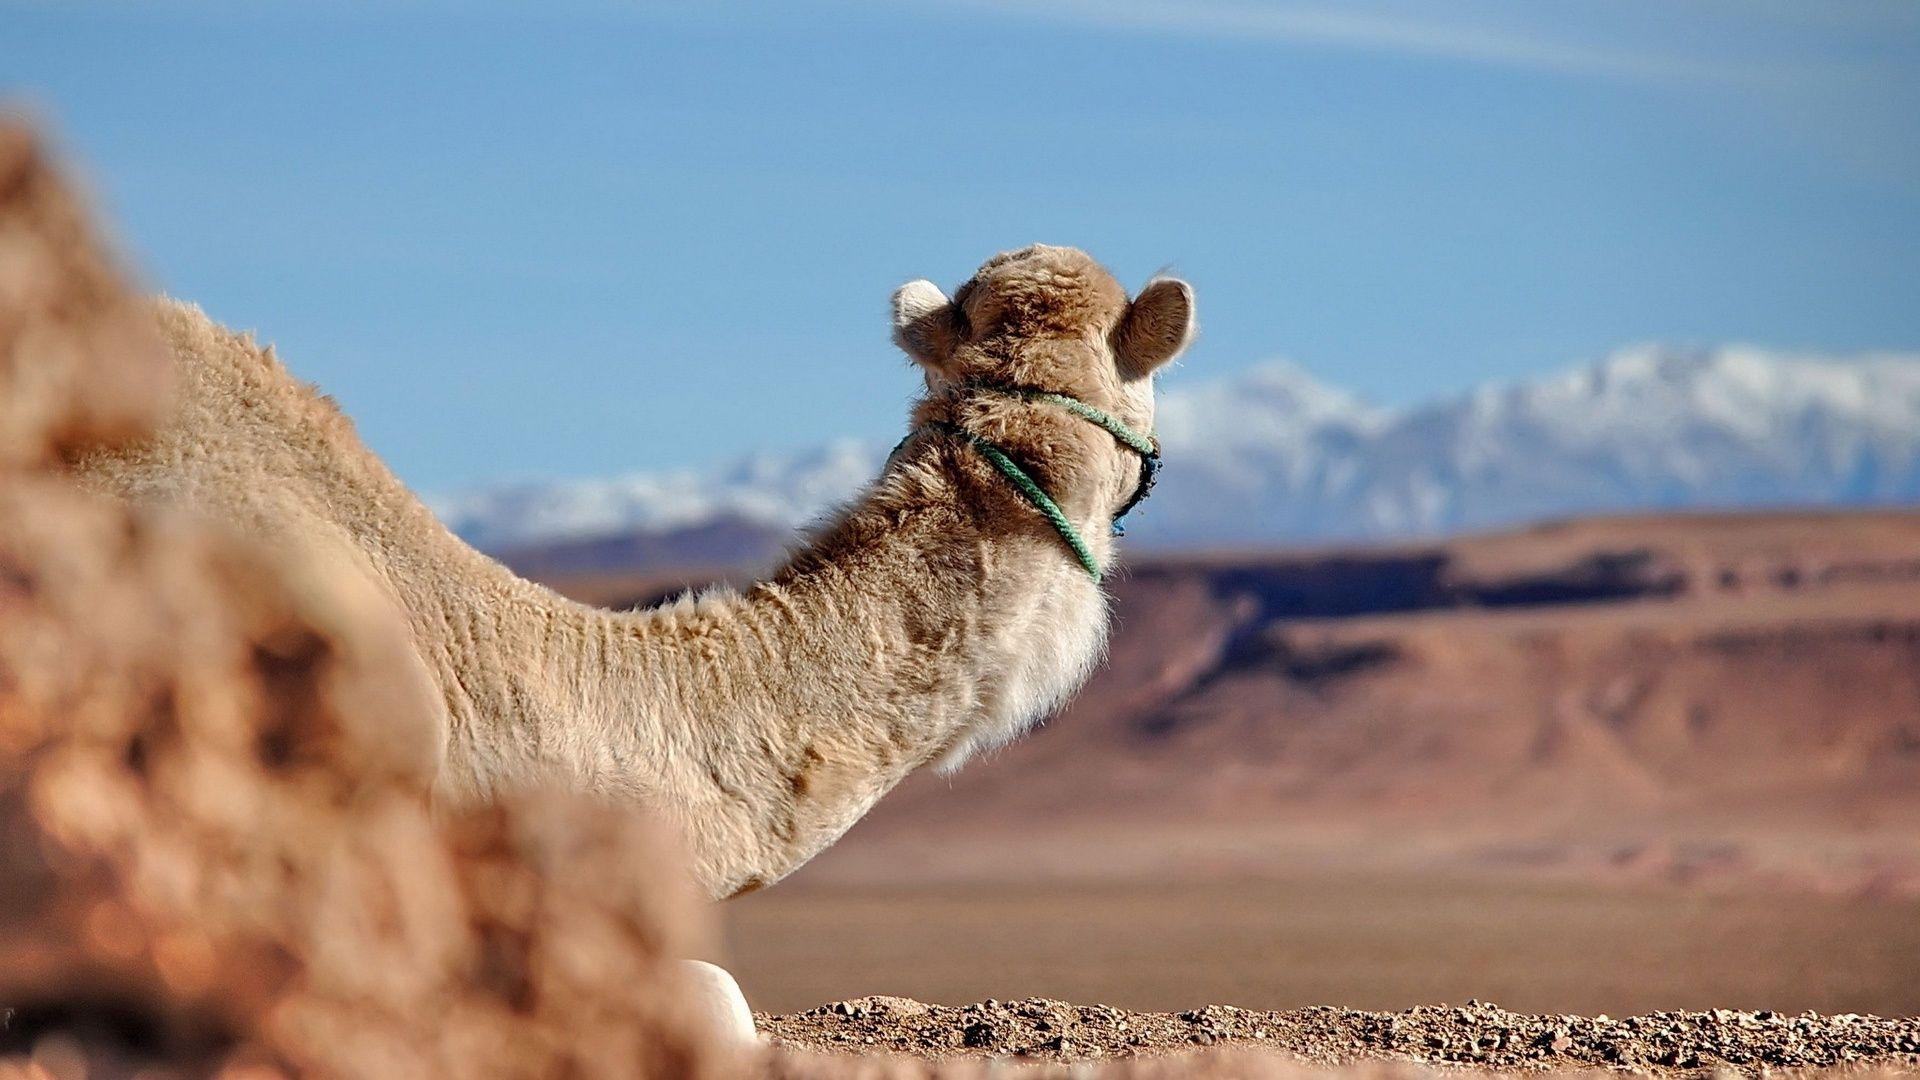 Camel Hd Photo